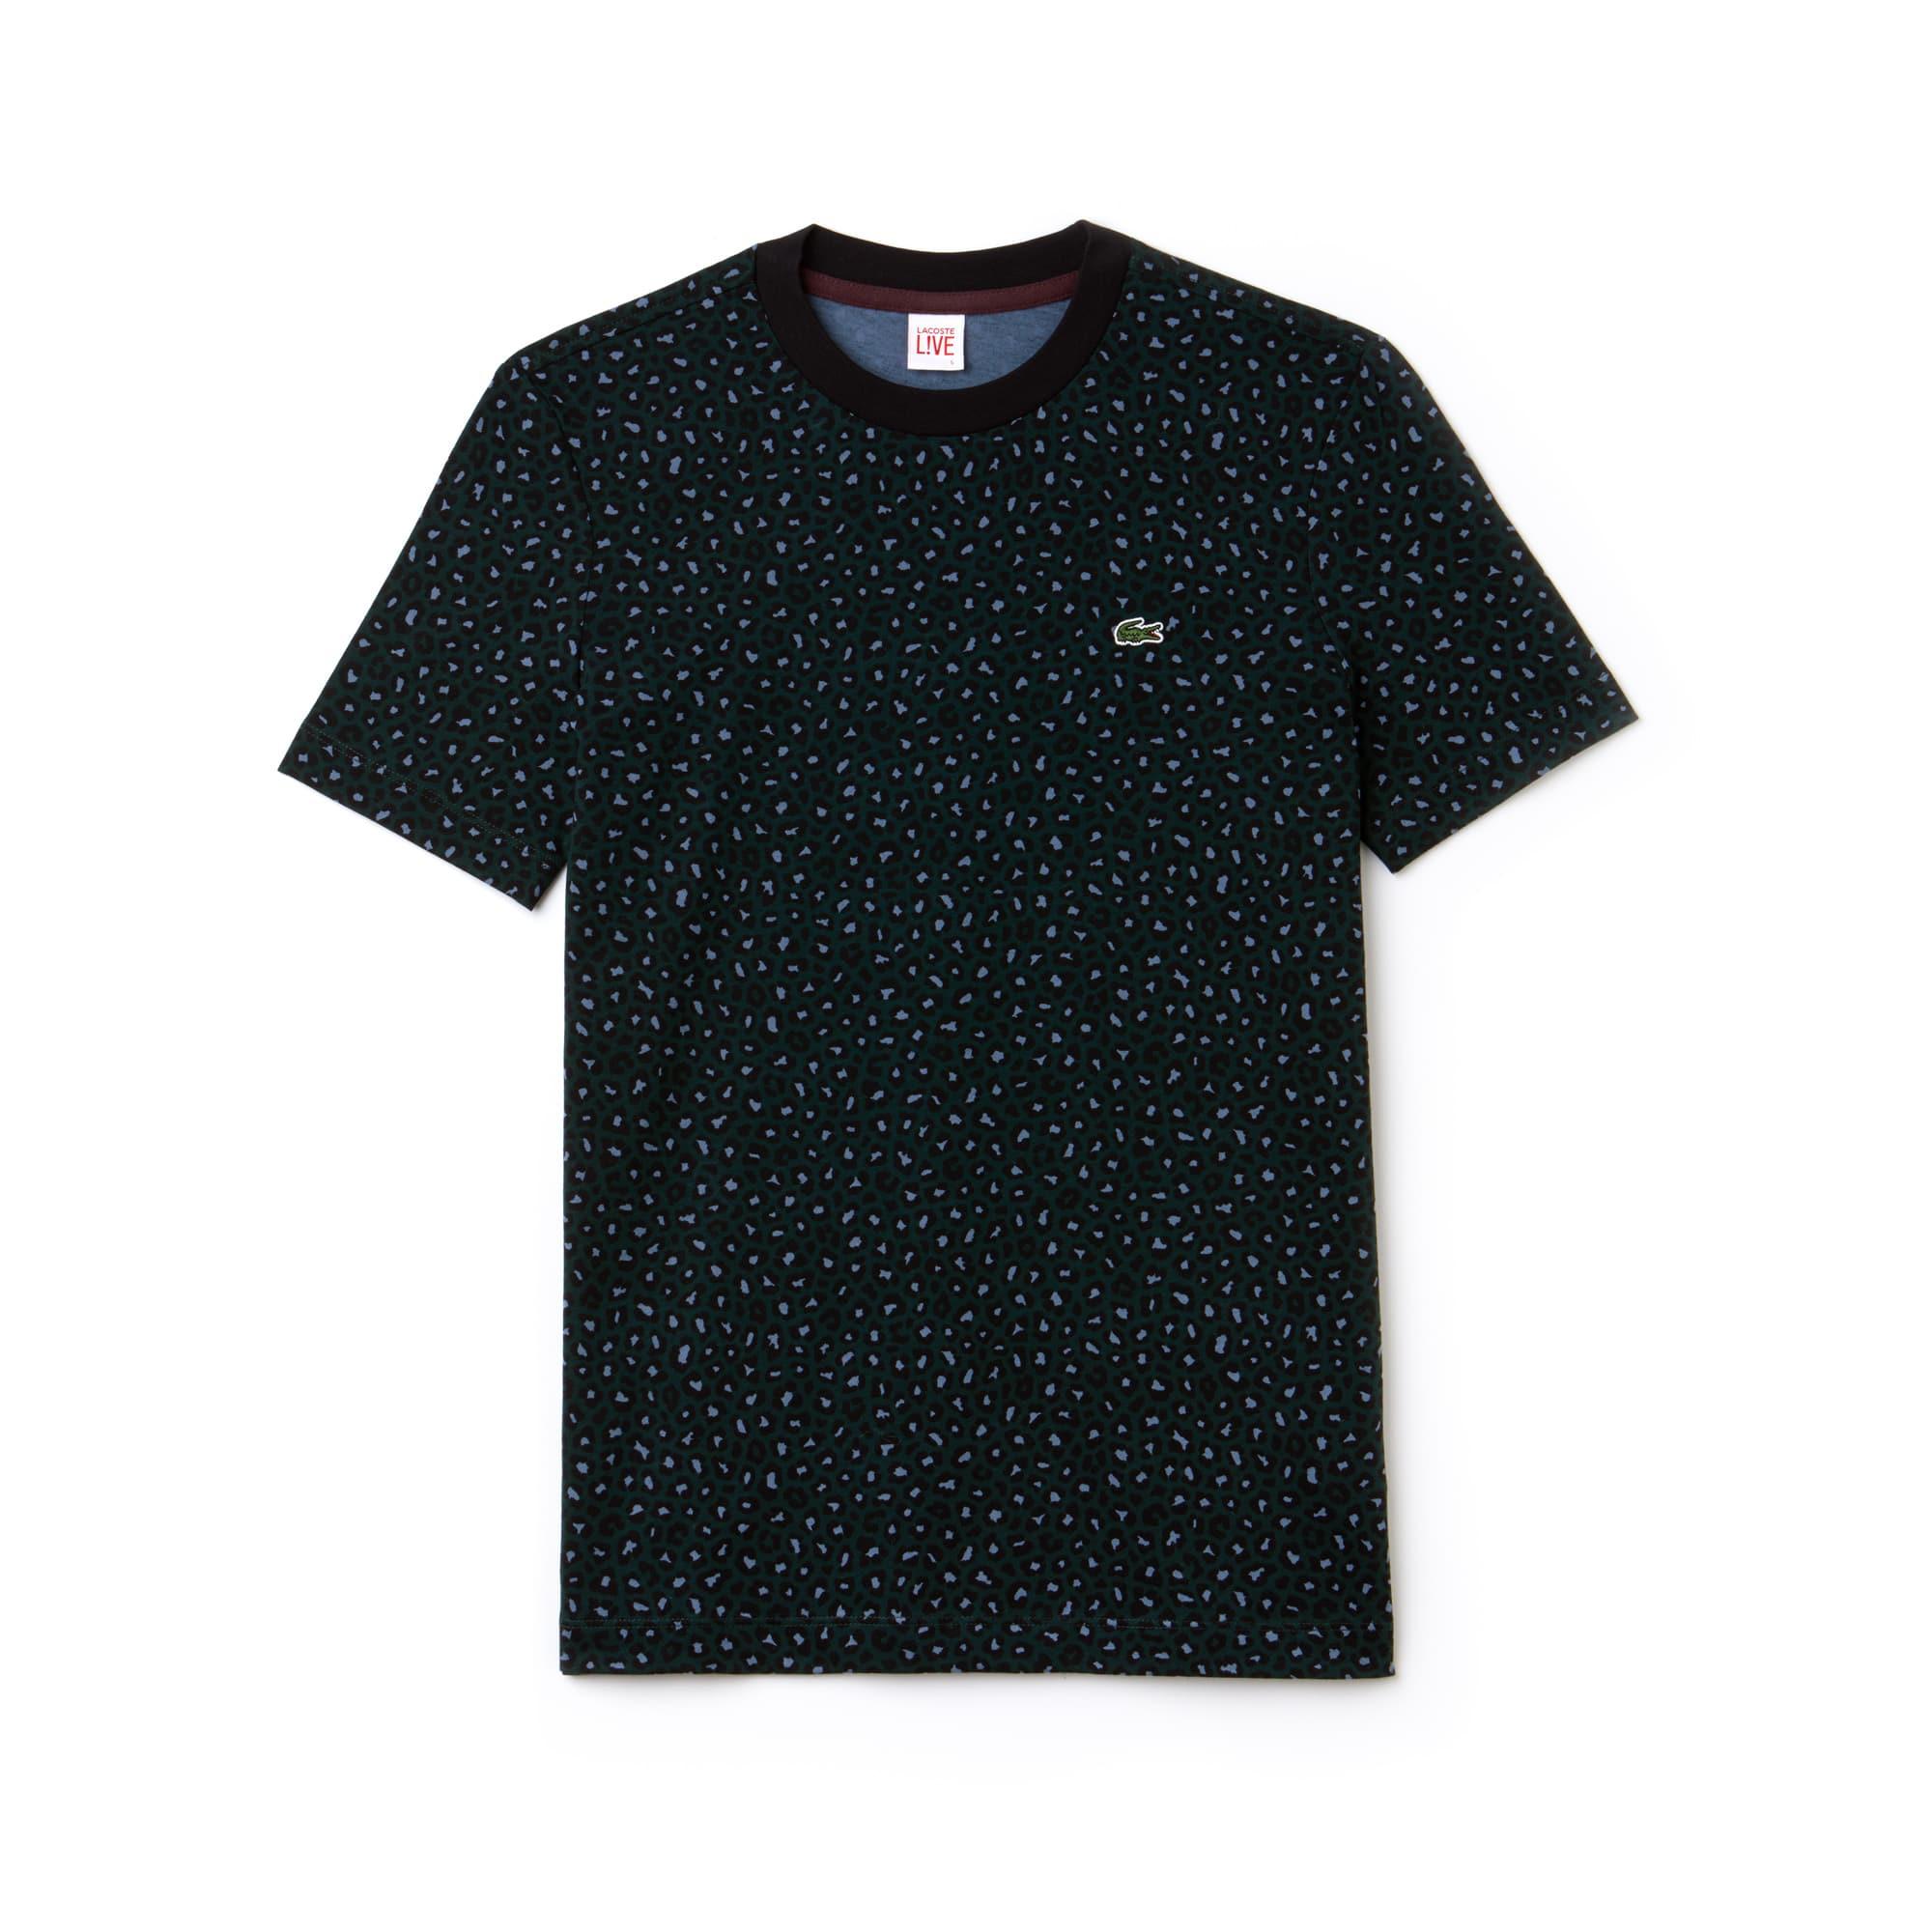 Herren-Rundhals-Shirt aus bedrucktem Jersey LACOSTE L!VE